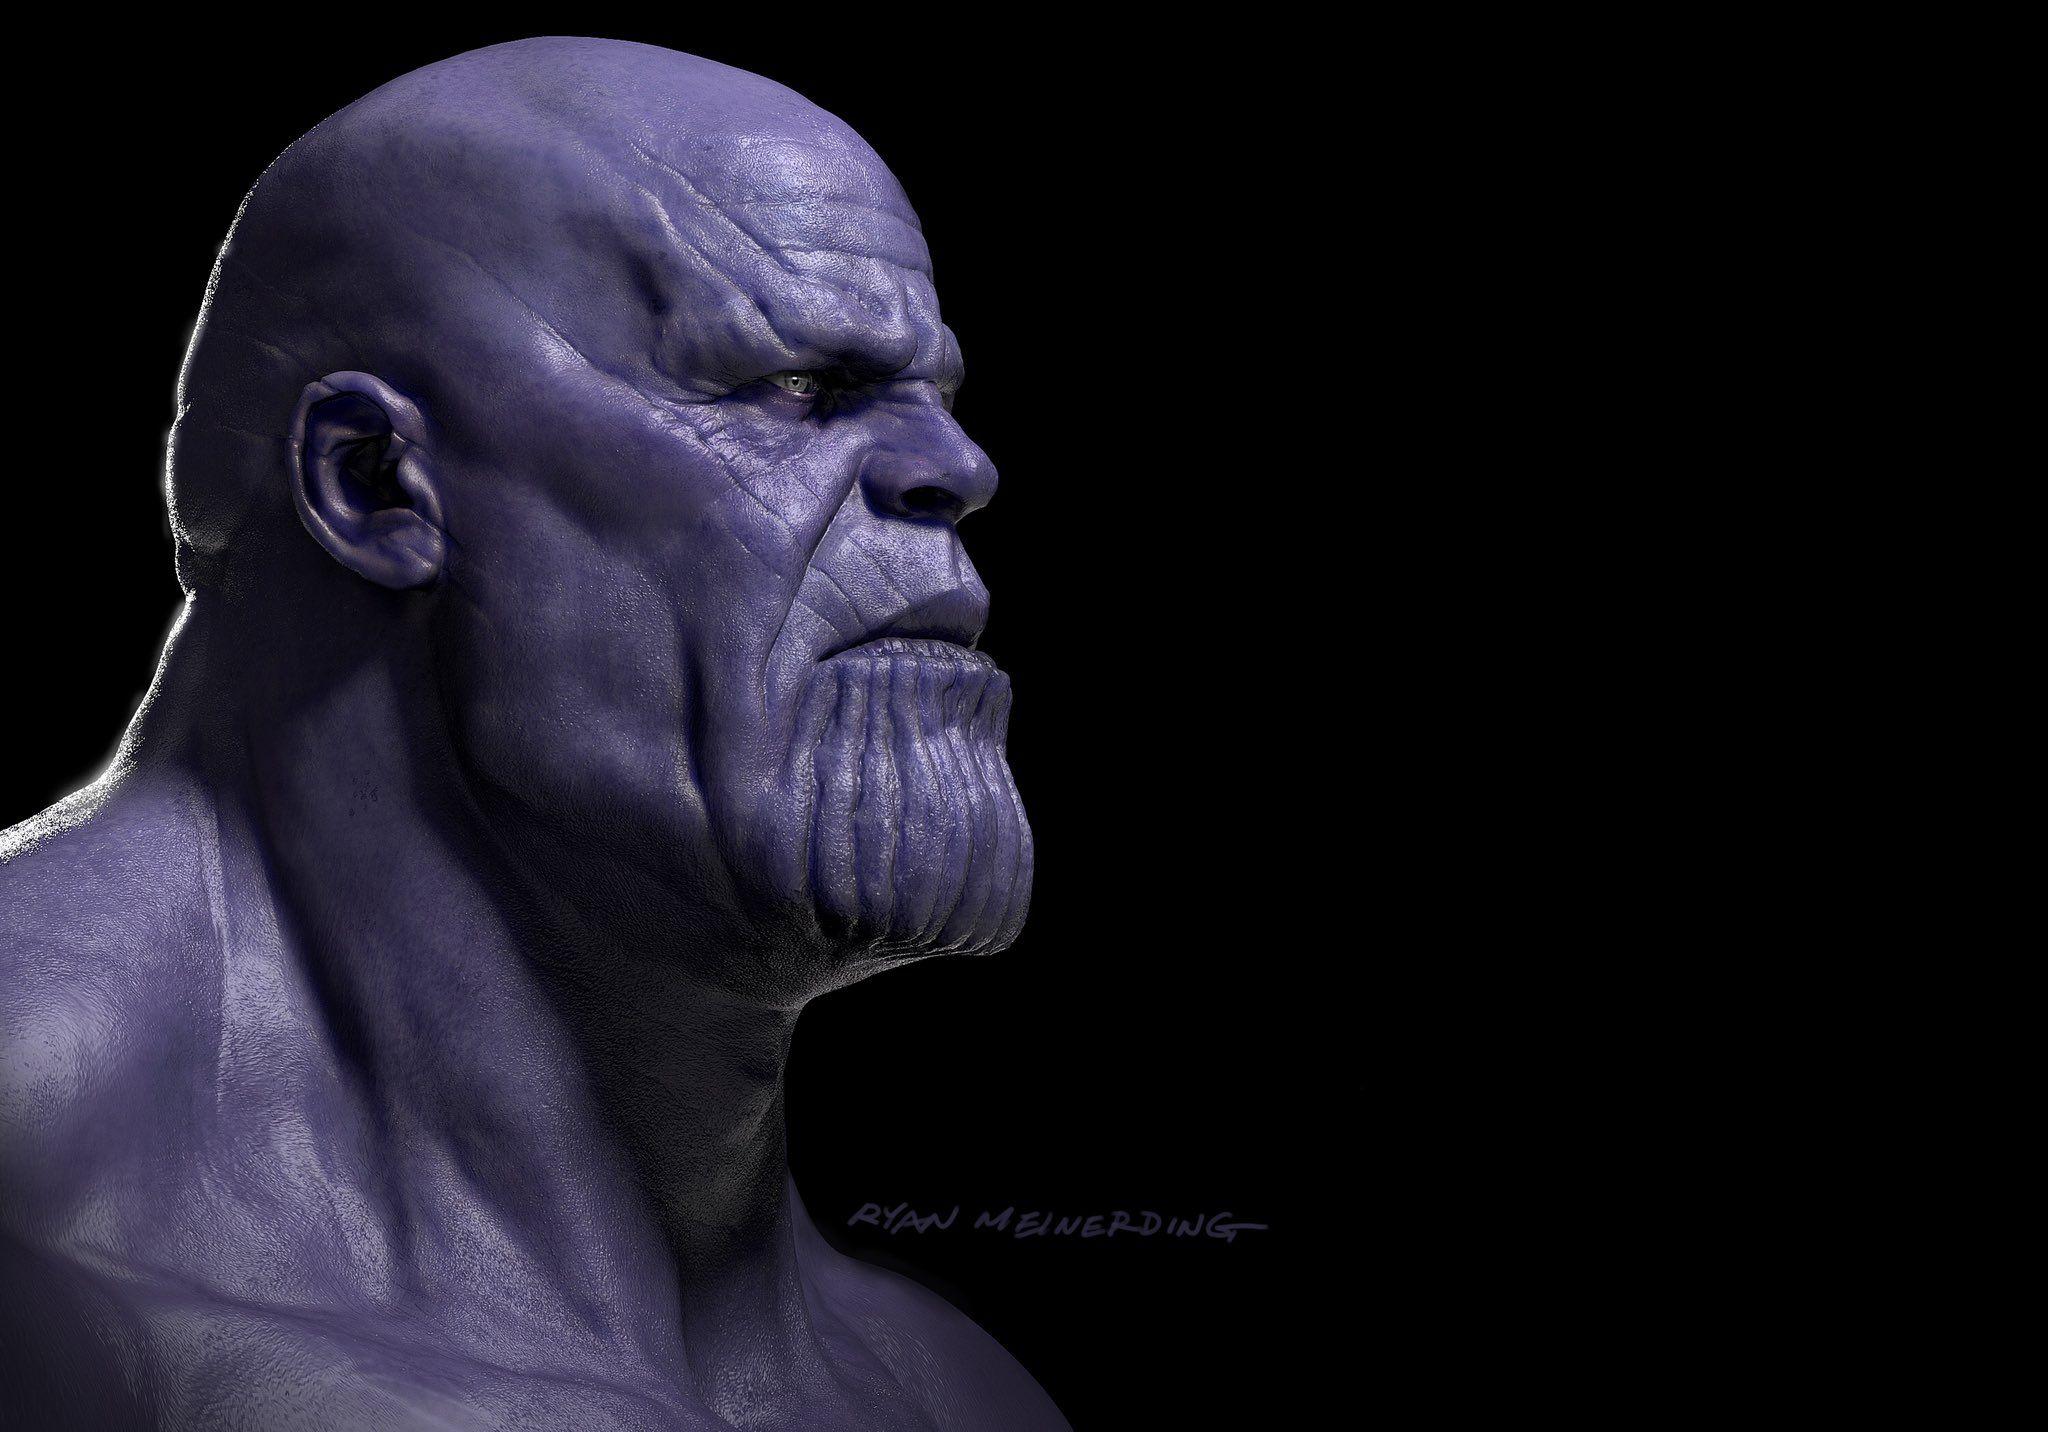 Avengers Infinity War Thanos The Infinity Gauntlet Marvel Characters Art Character Design Character Art